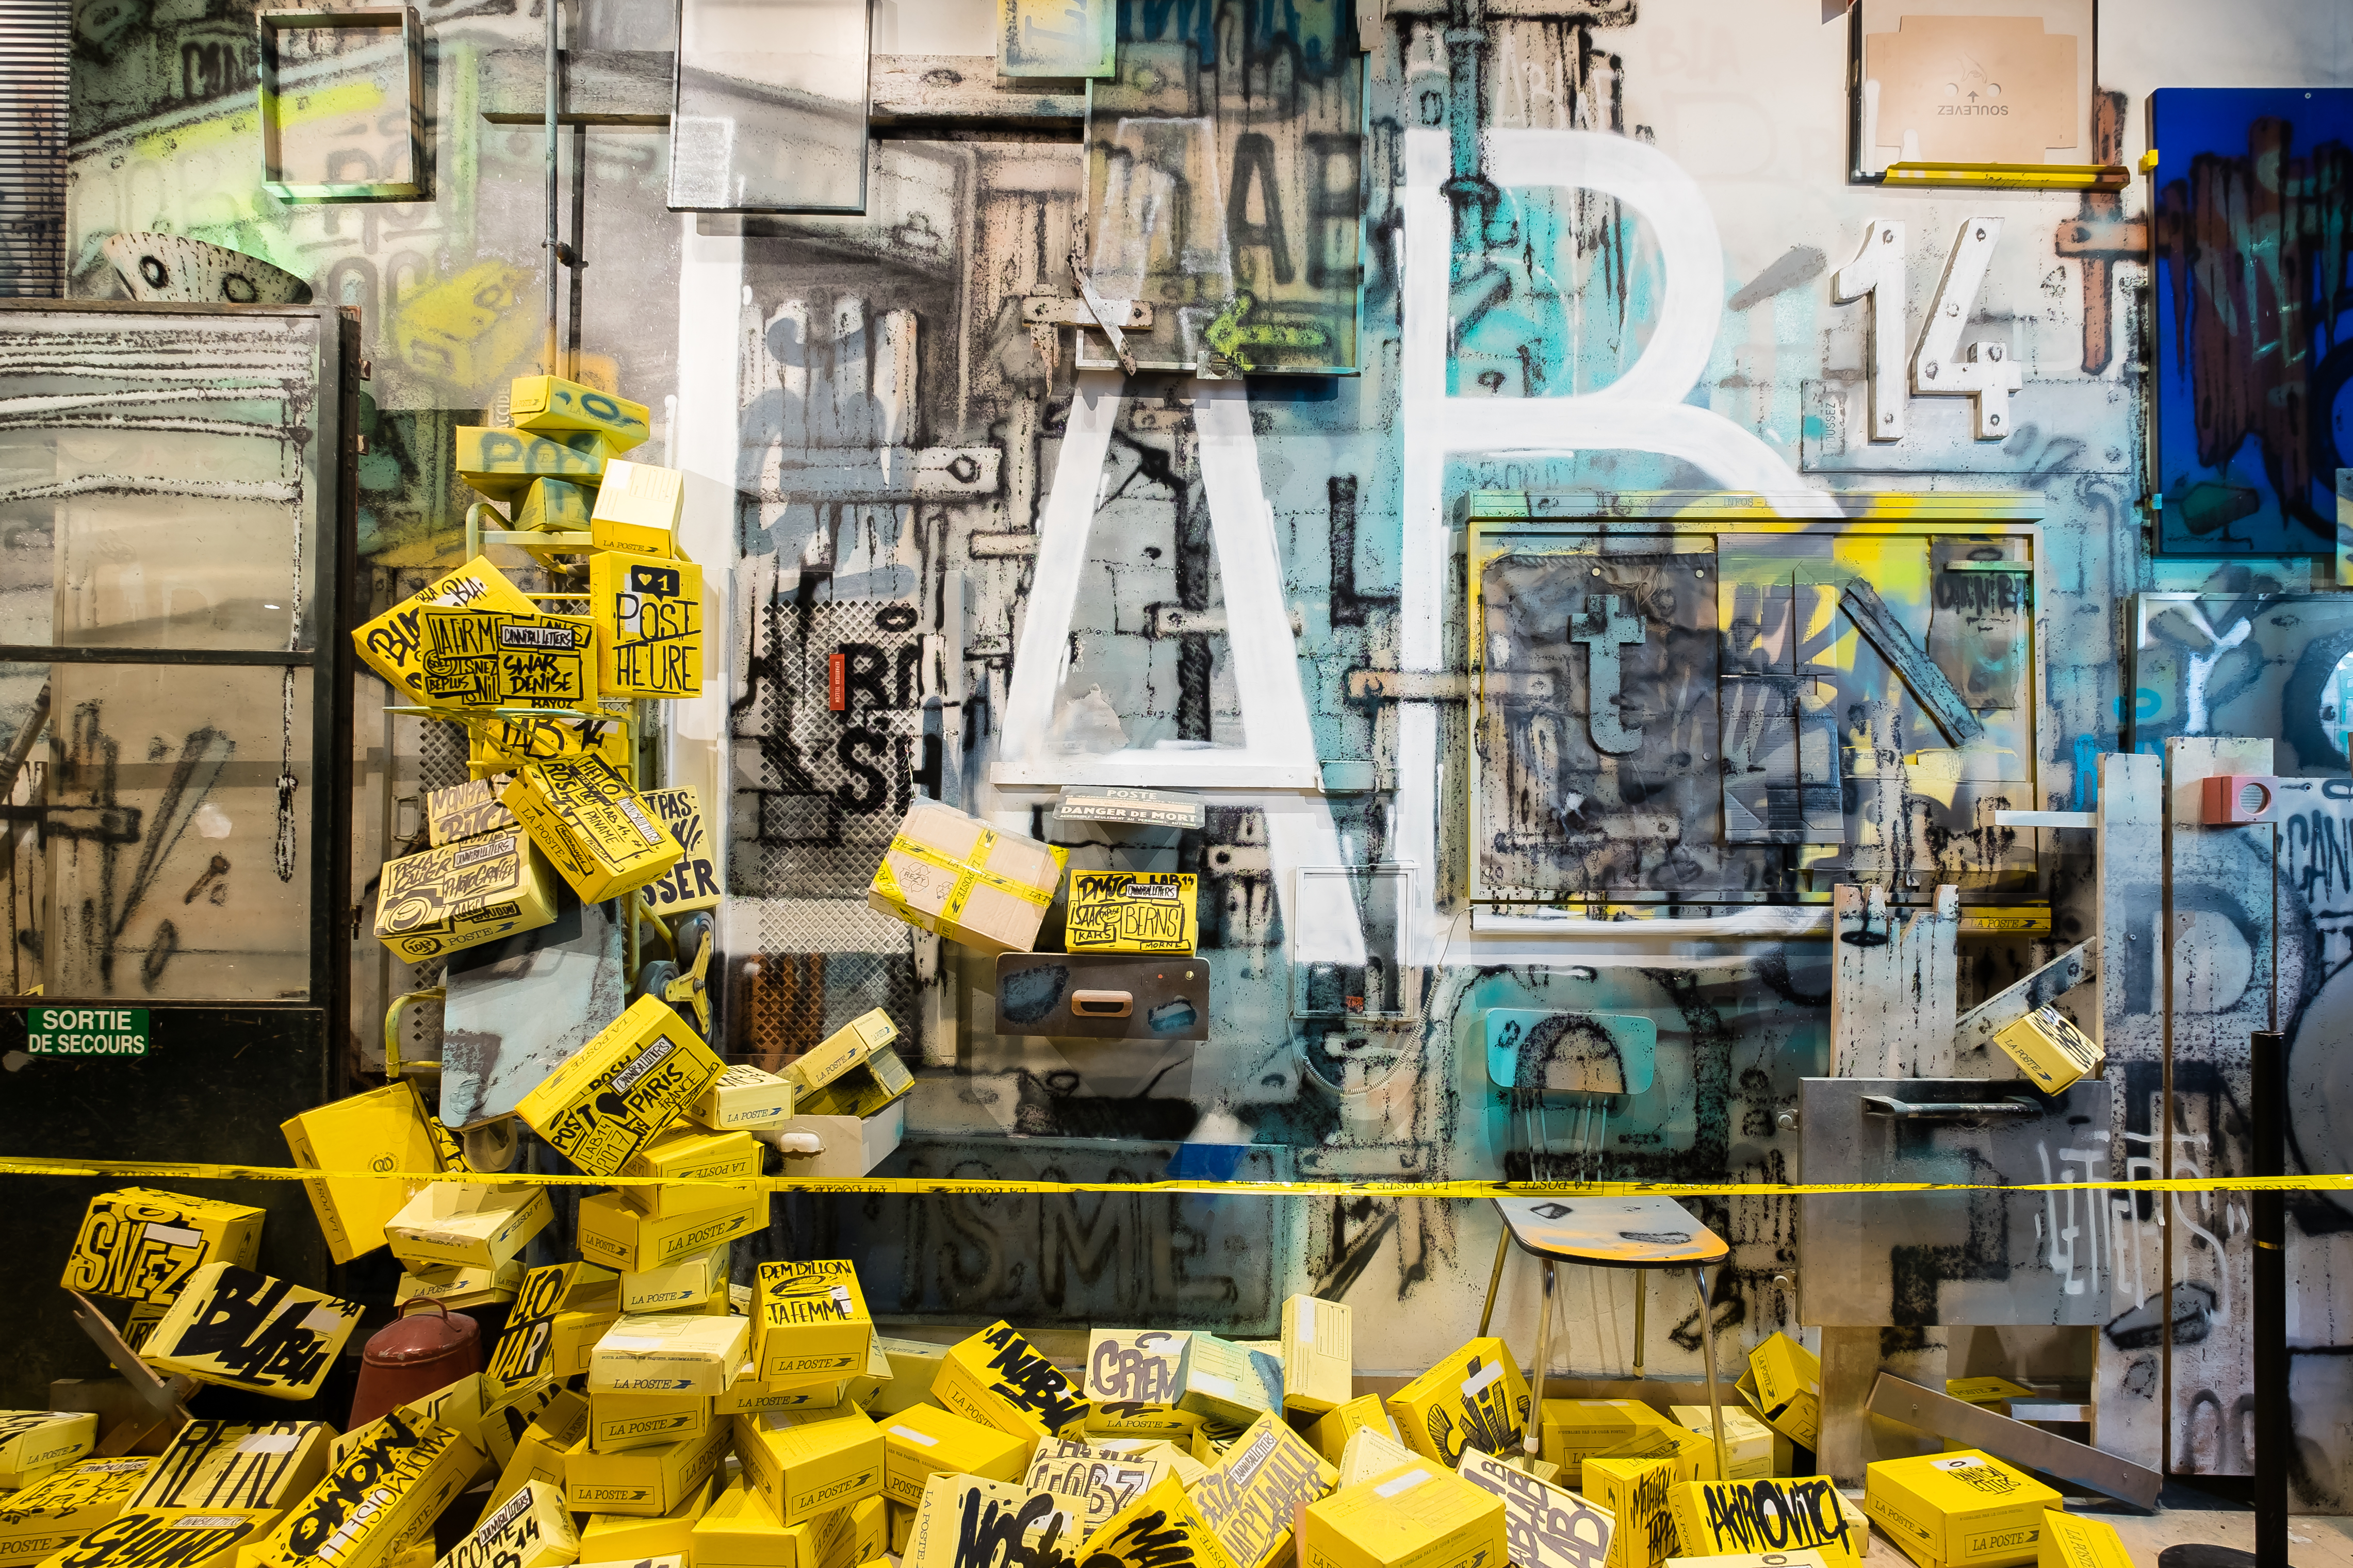 Lab 14 Le street art s'expose à Montparnasse